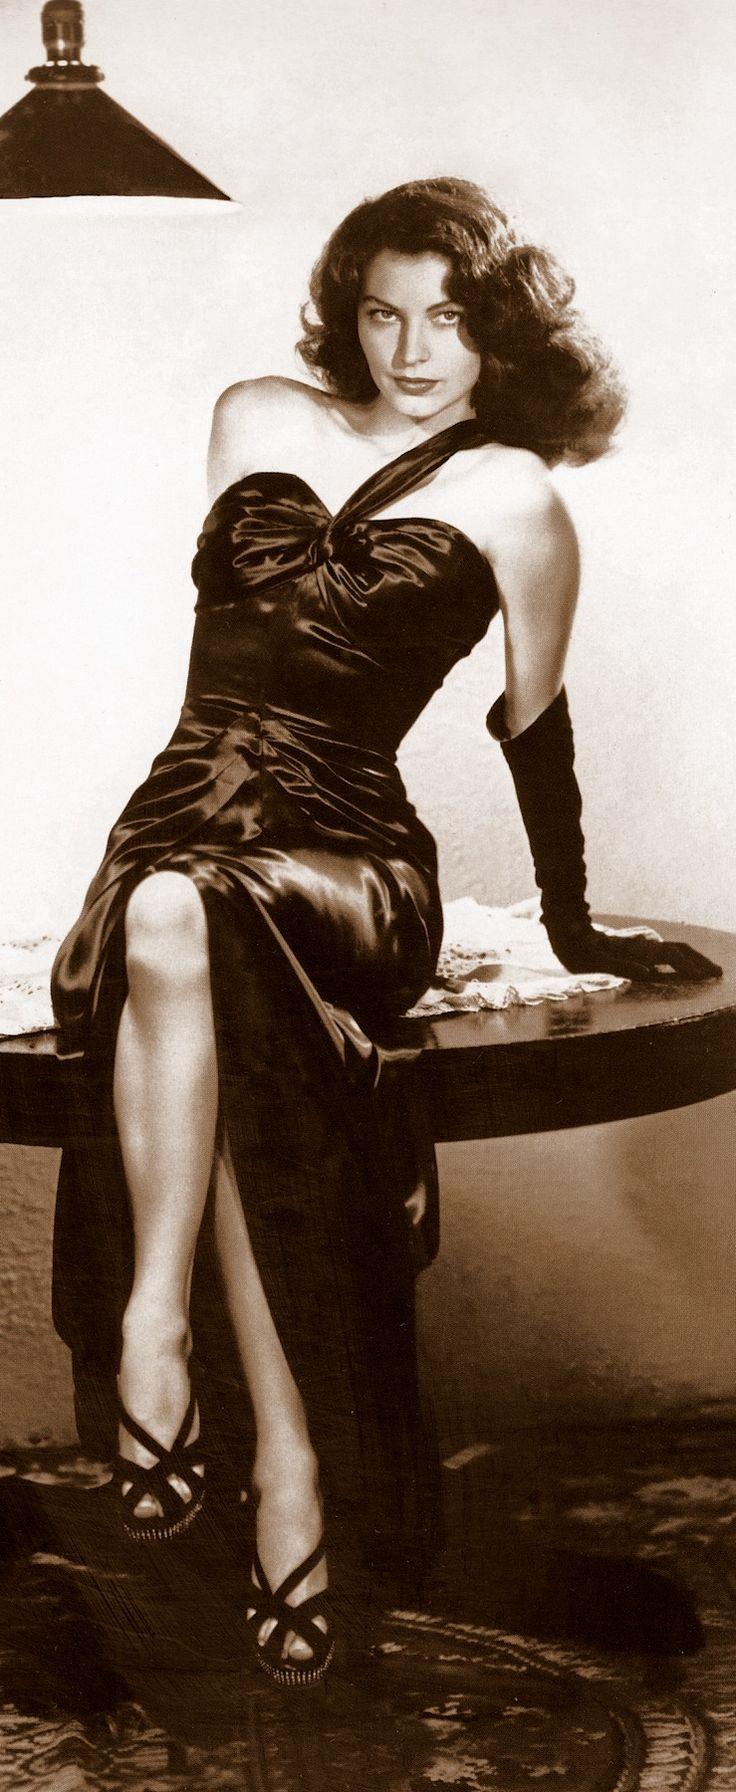 AVA GARDNER as Kitty Collins in THE KILLERS (1946) dir: Robert Siodmak. prod: Mark Hellinger. Gown by VERA WEST.